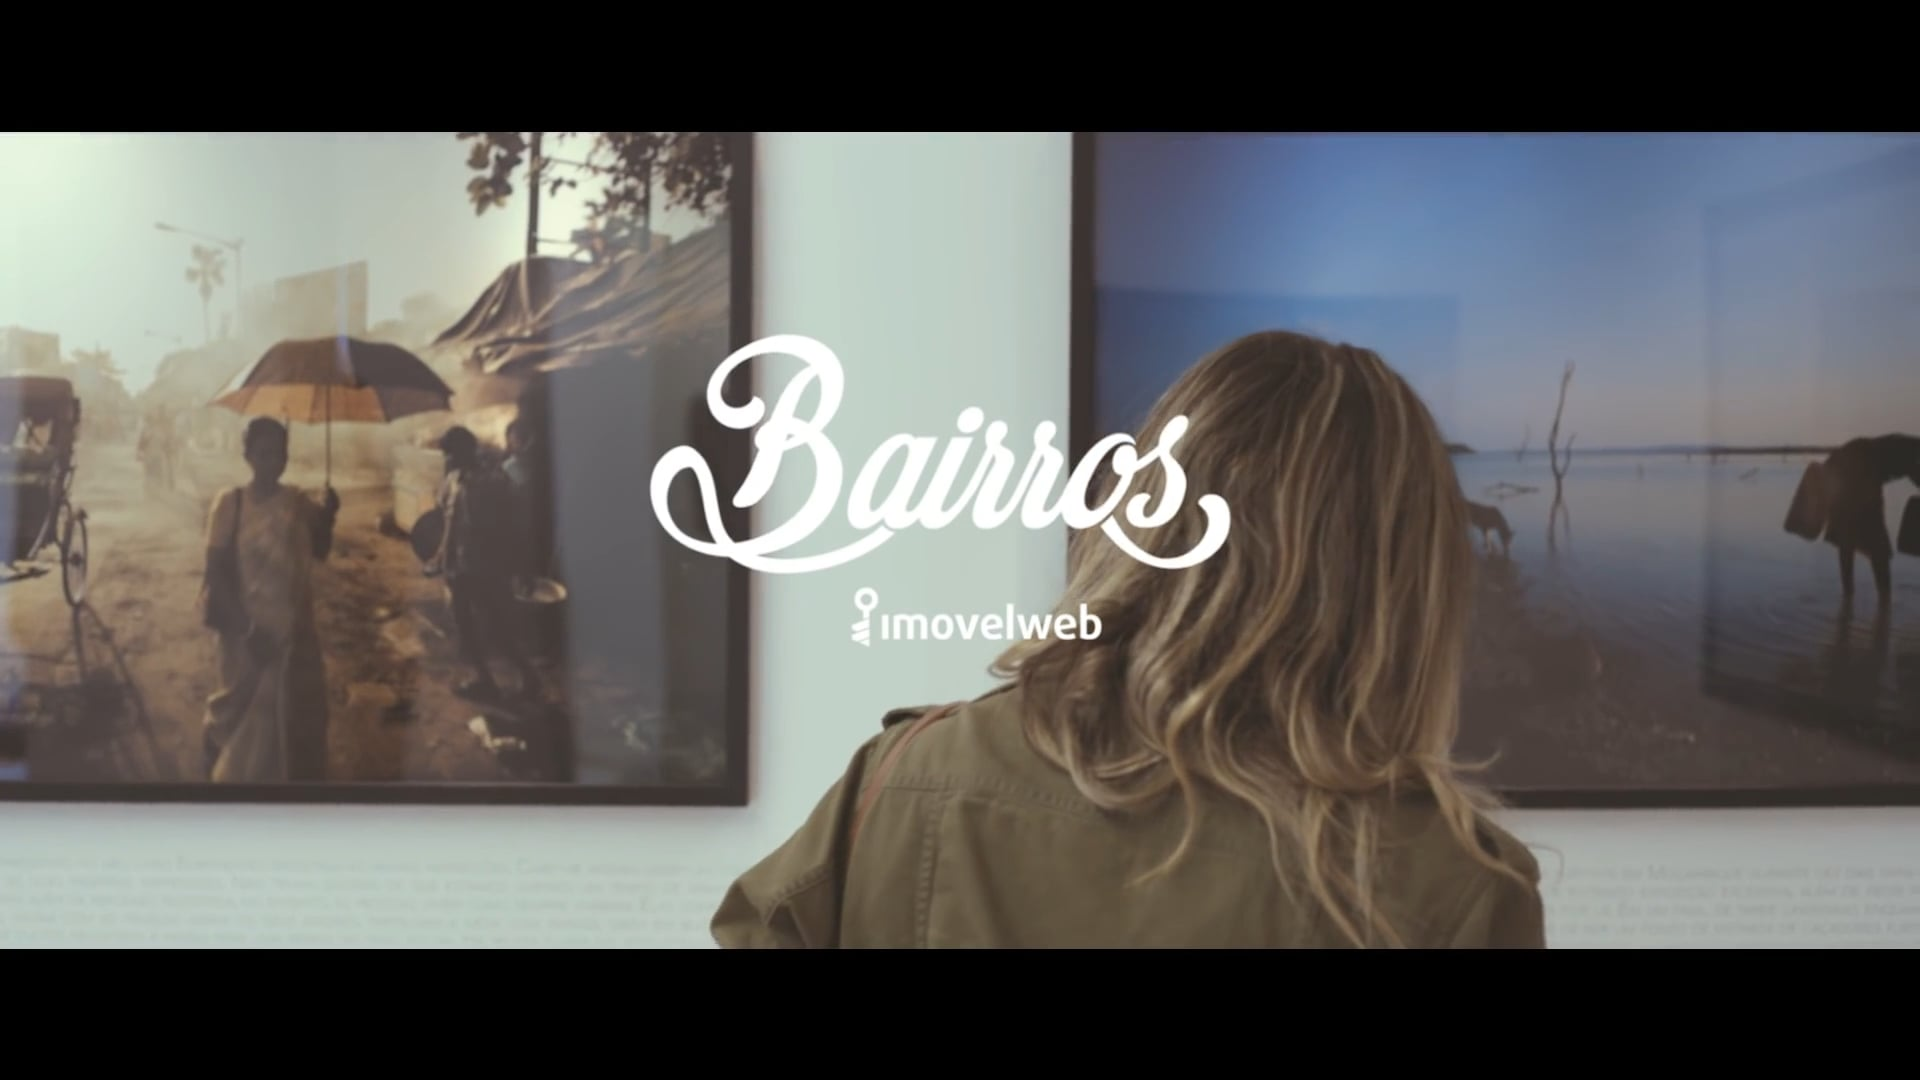 05 Bairros: Higienópolis